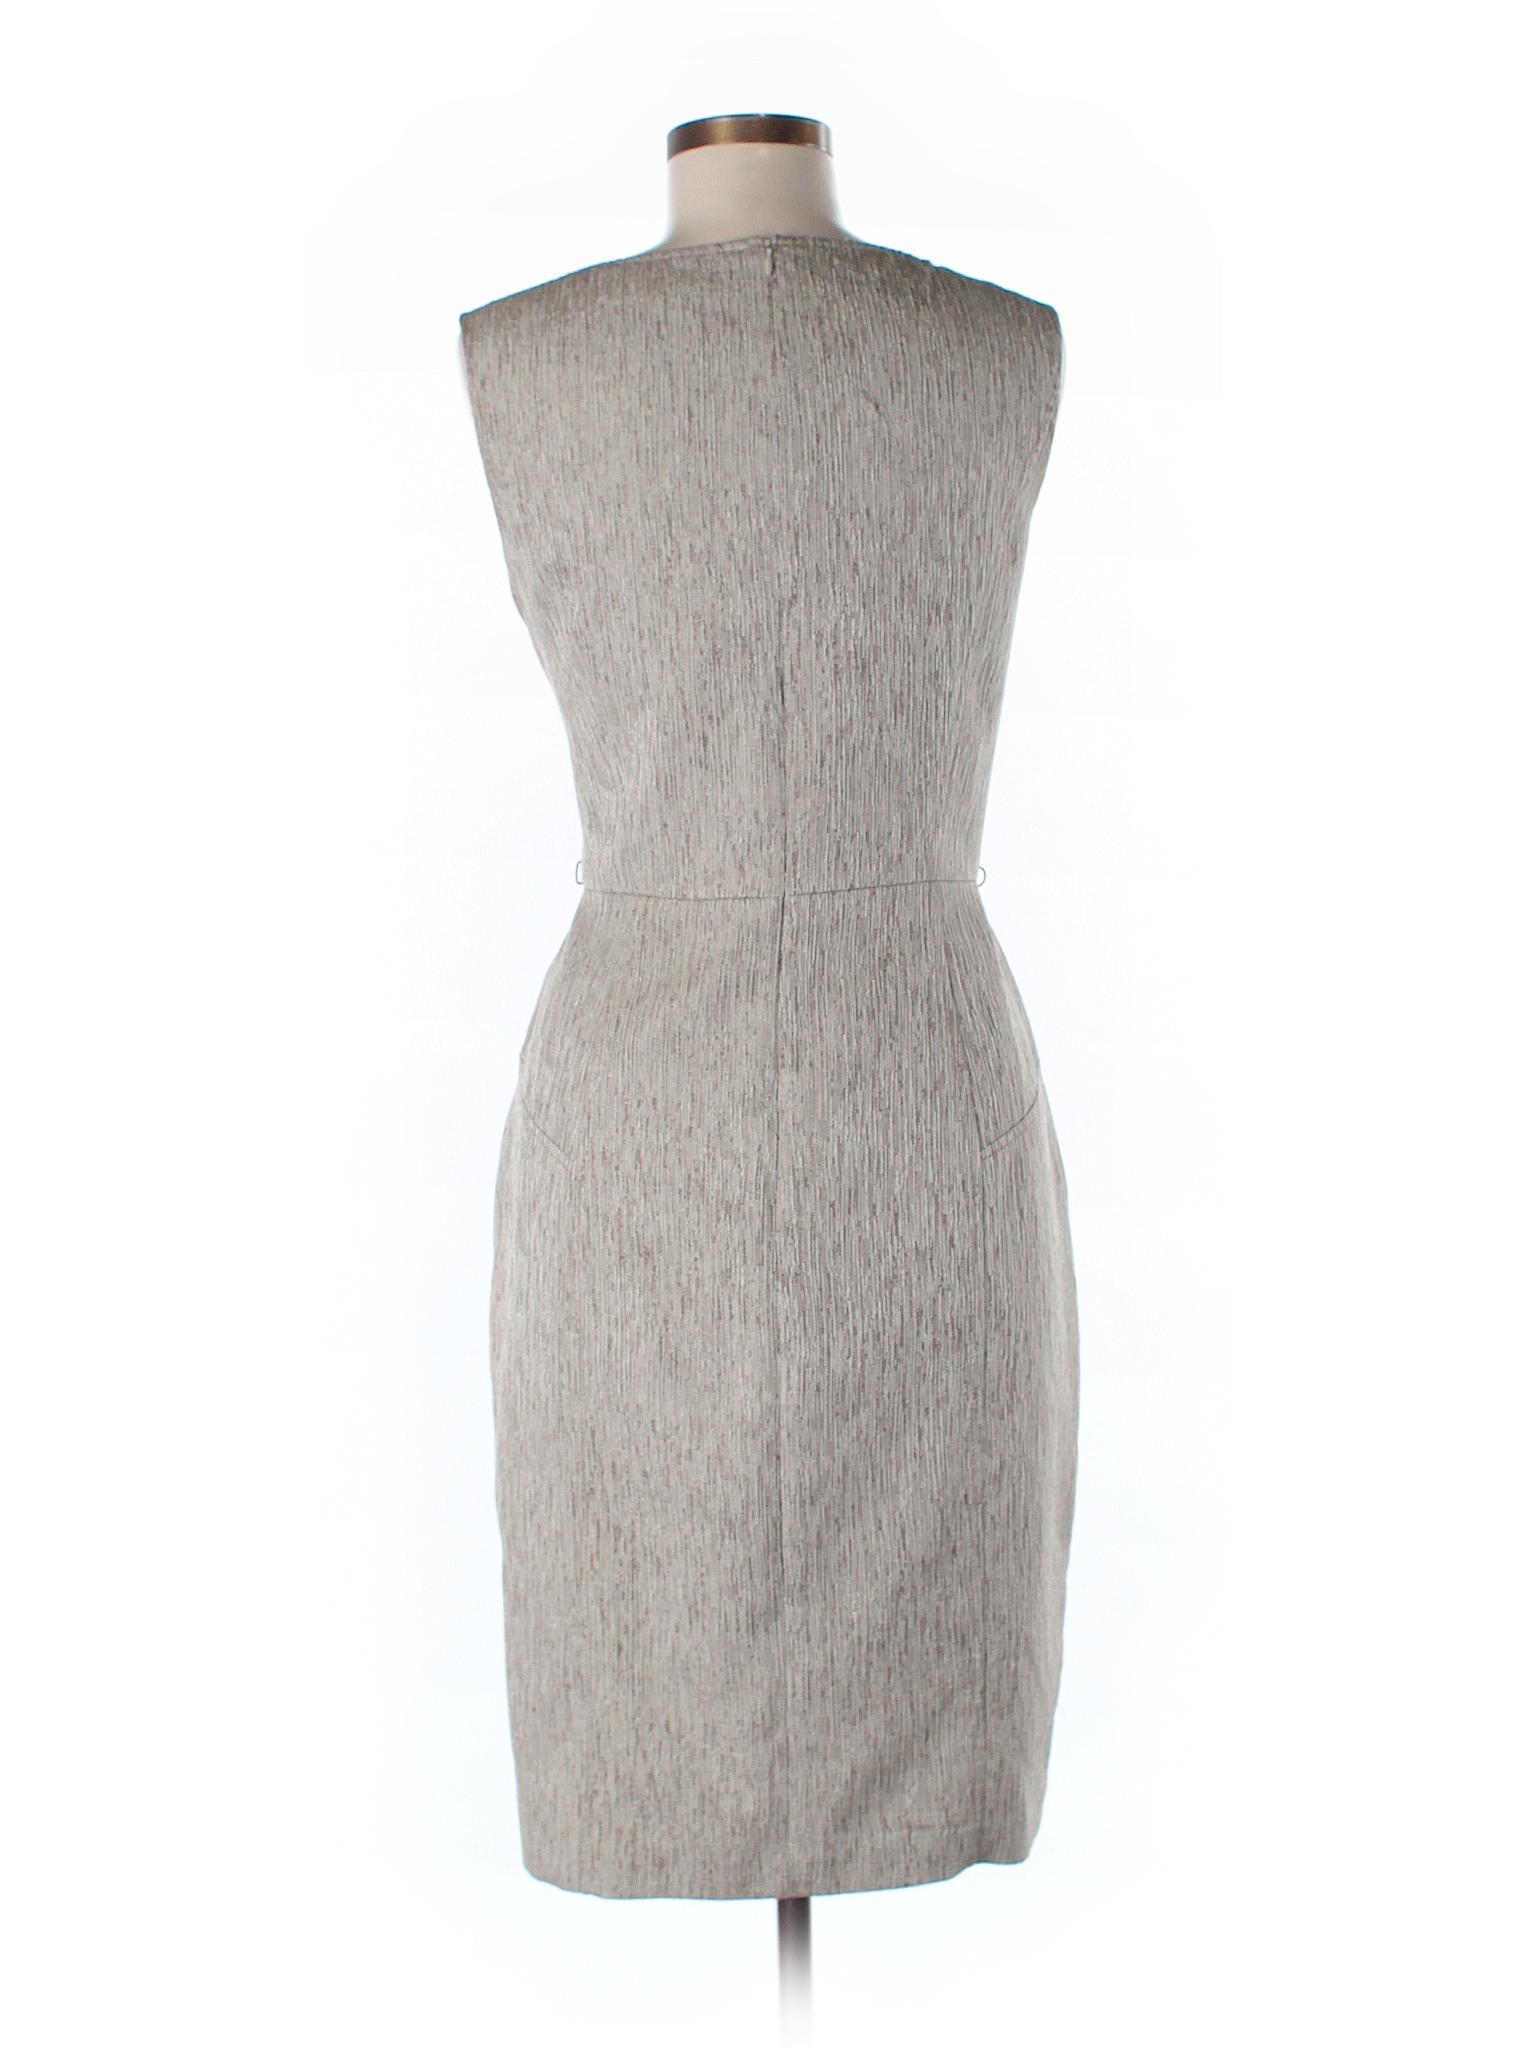 Casual Meister David Dress Boutique winter wz5qExt